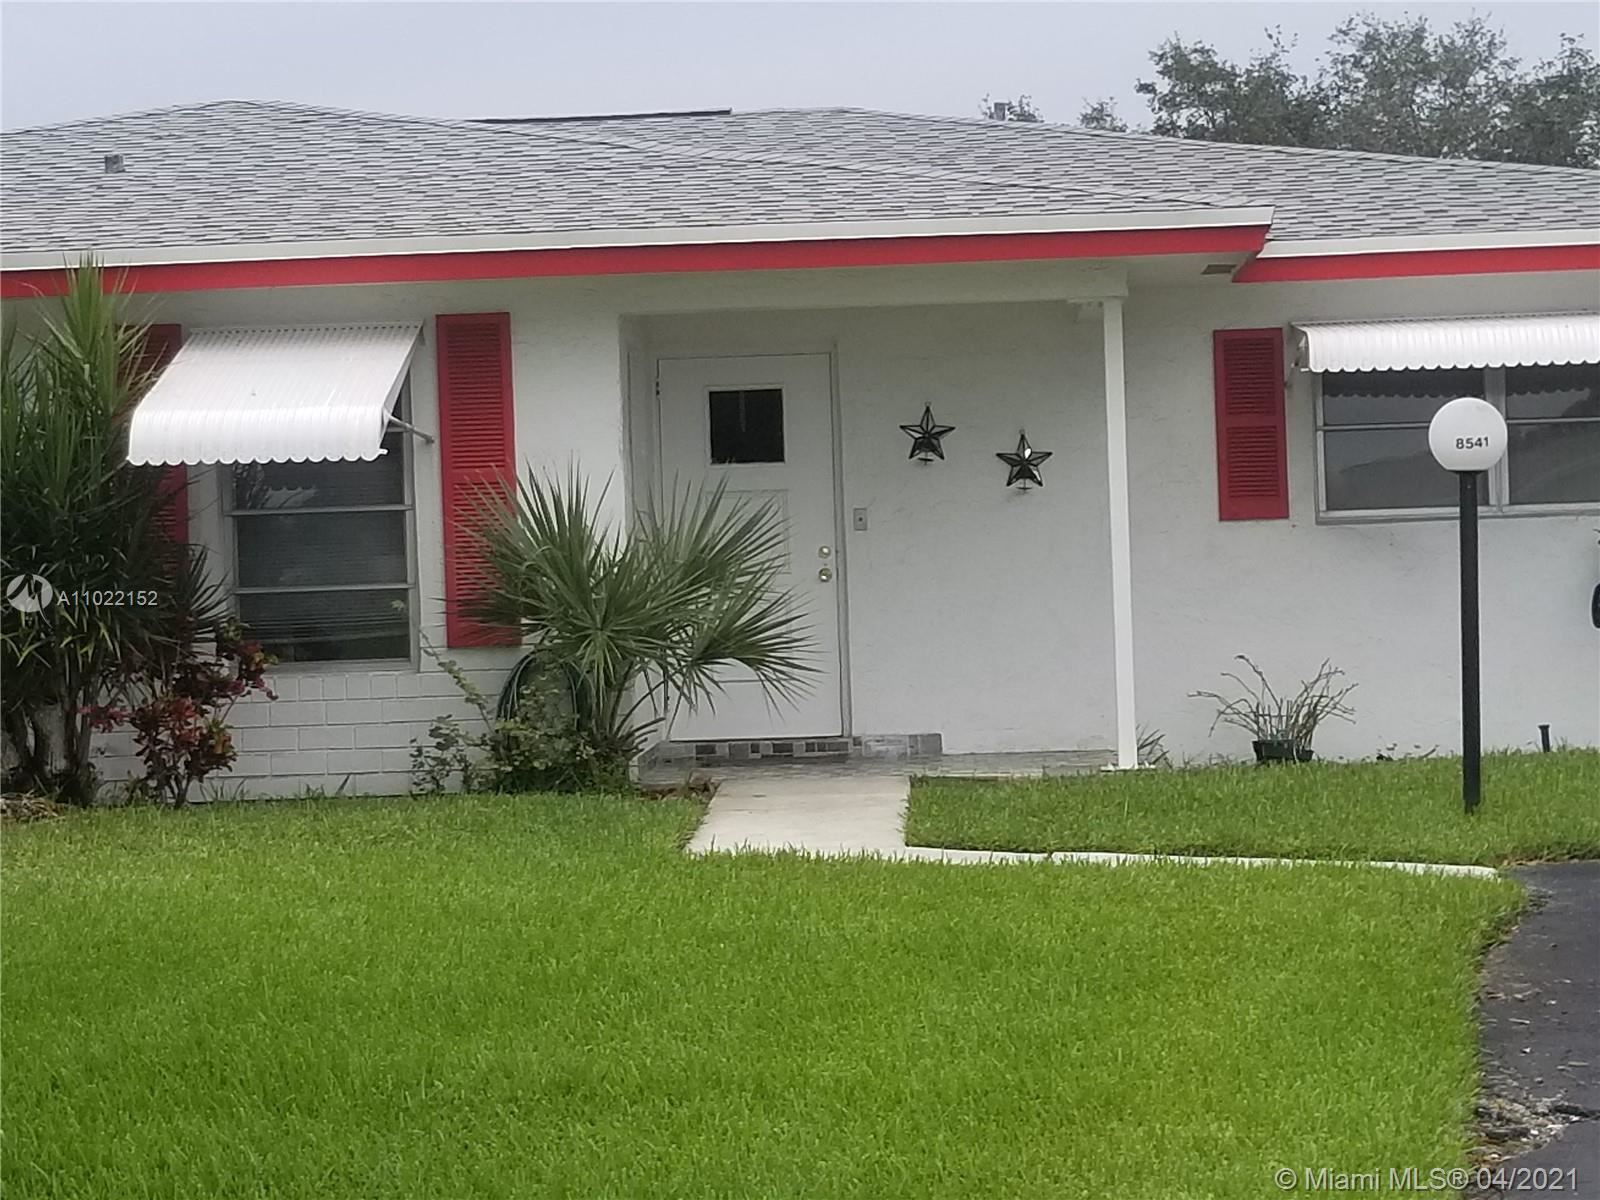 Photo of 8541 NW 11th St #B164, Plantation, FL 33322 (MLS # A11022152)